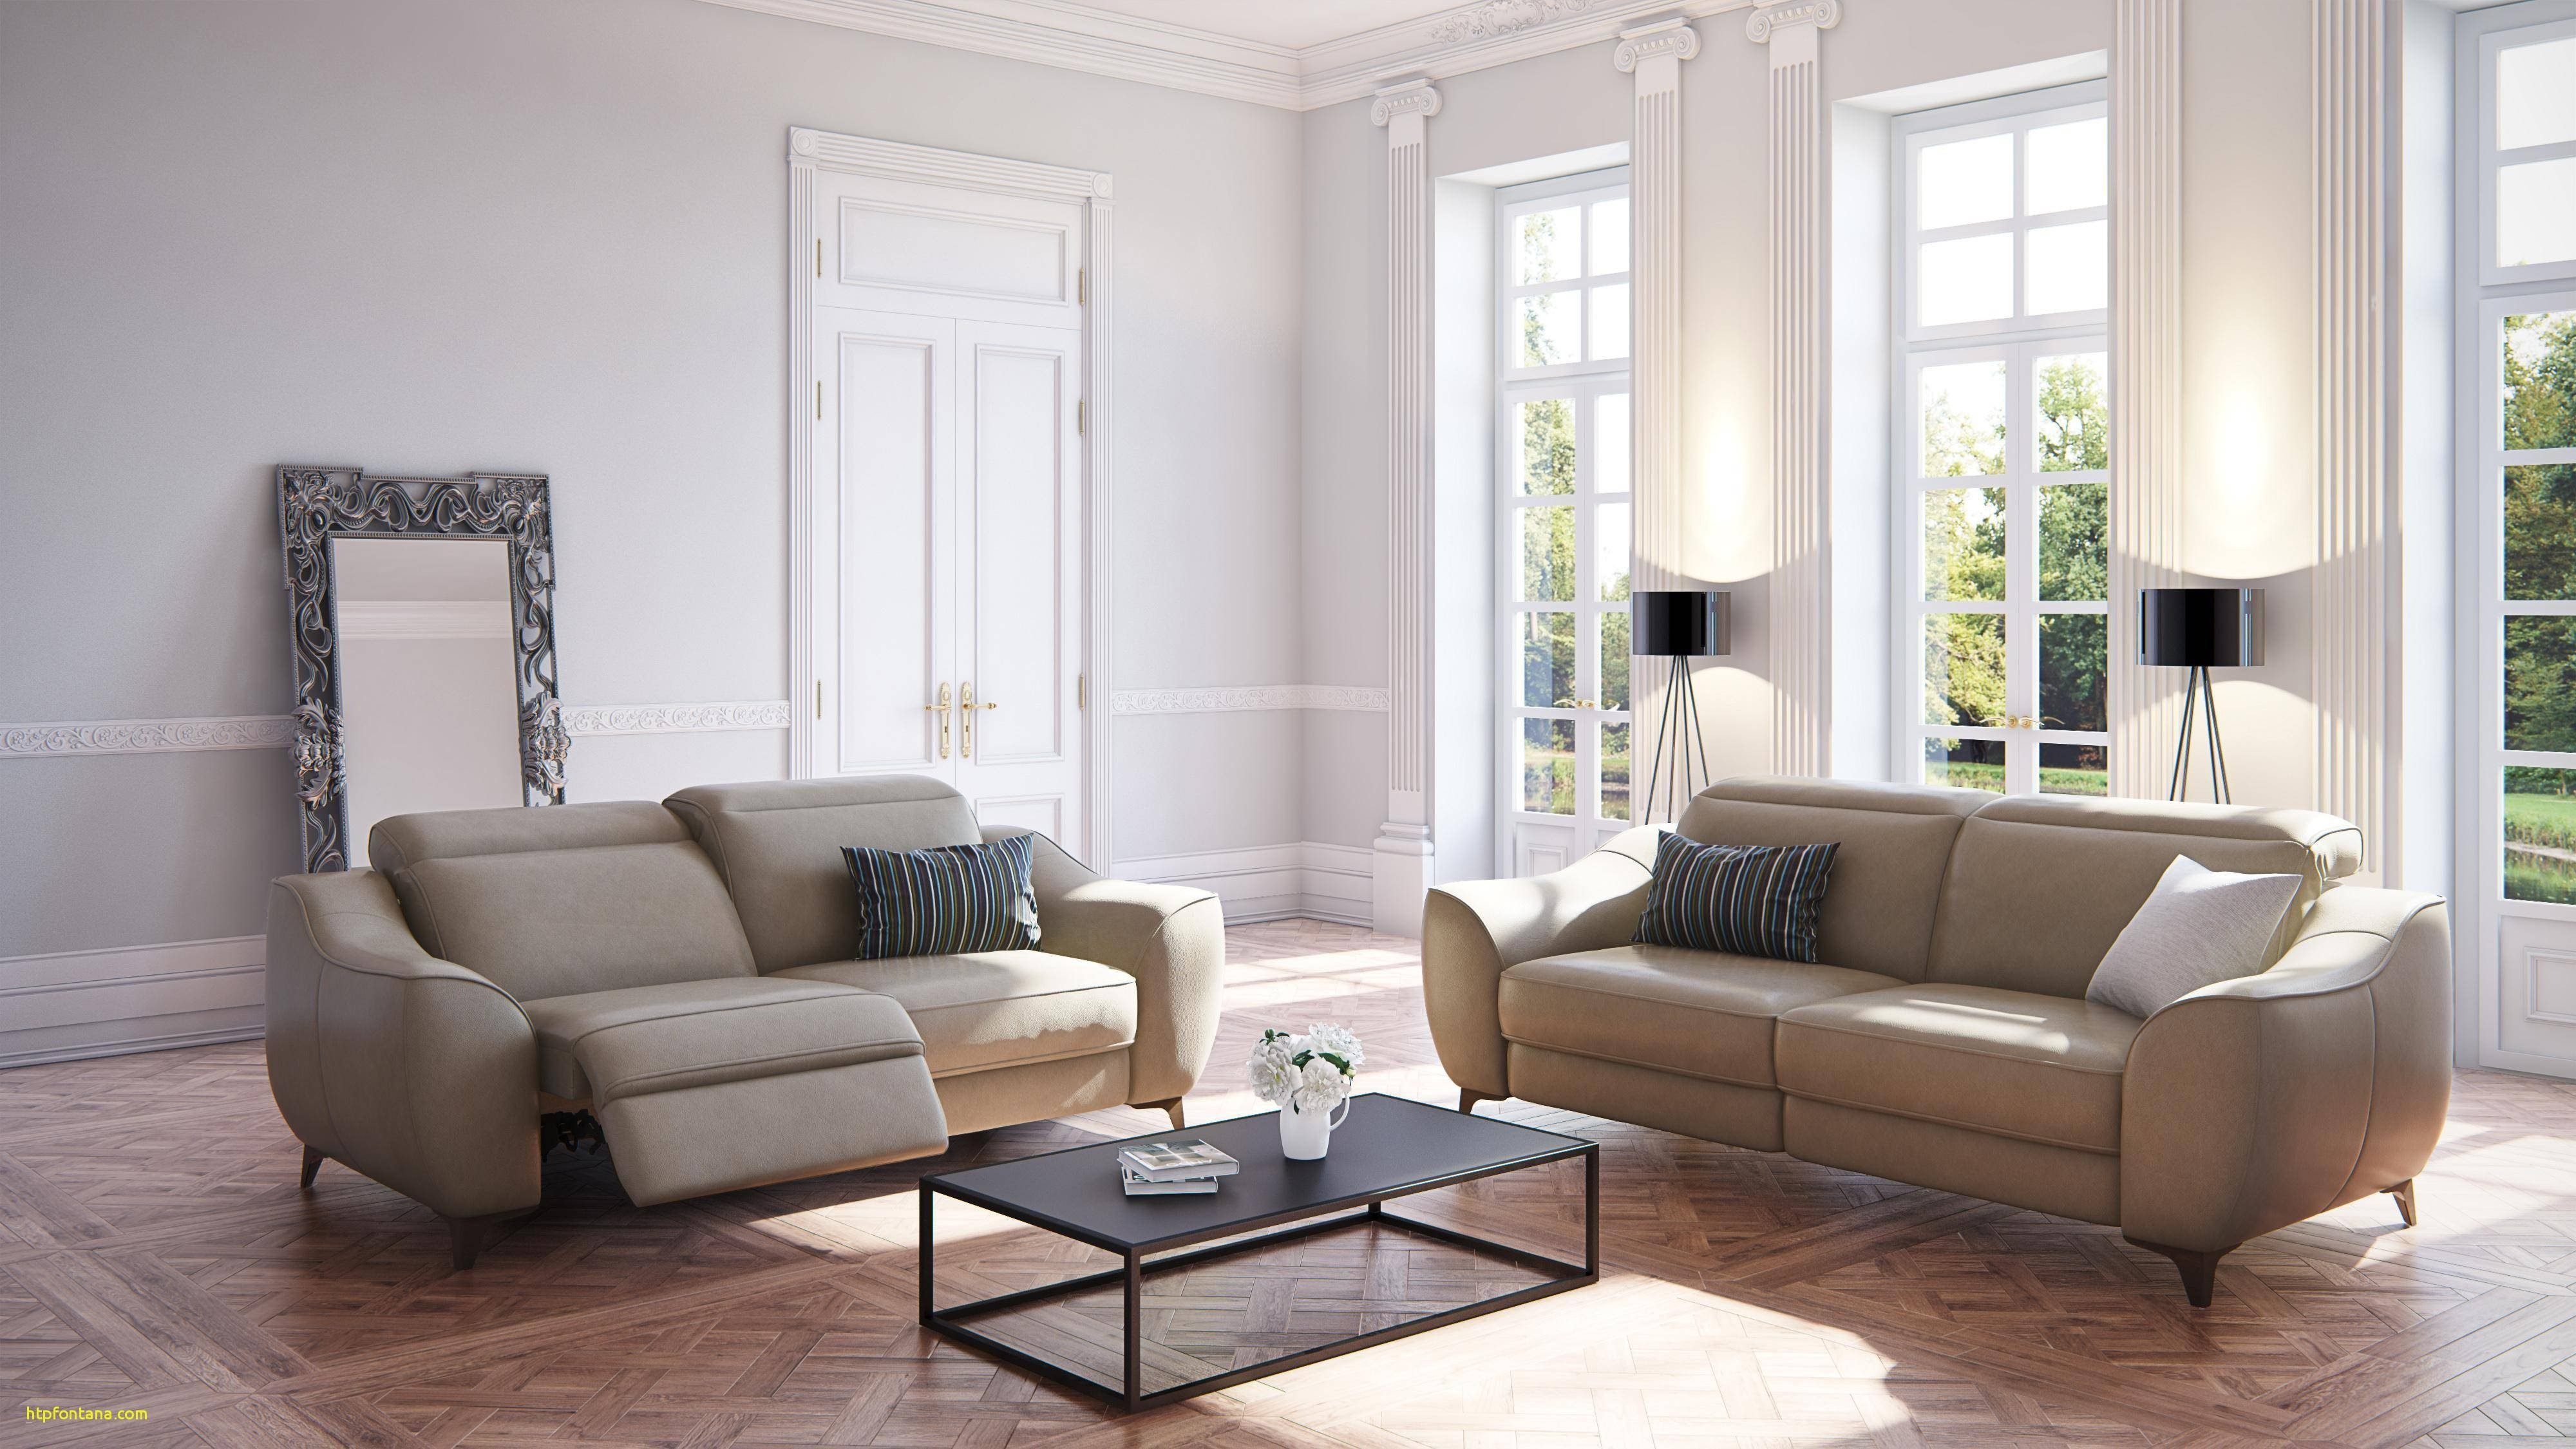 Classy Comfortable Living Room Fresh Living Room Elegant Design Decorating Small Rooms